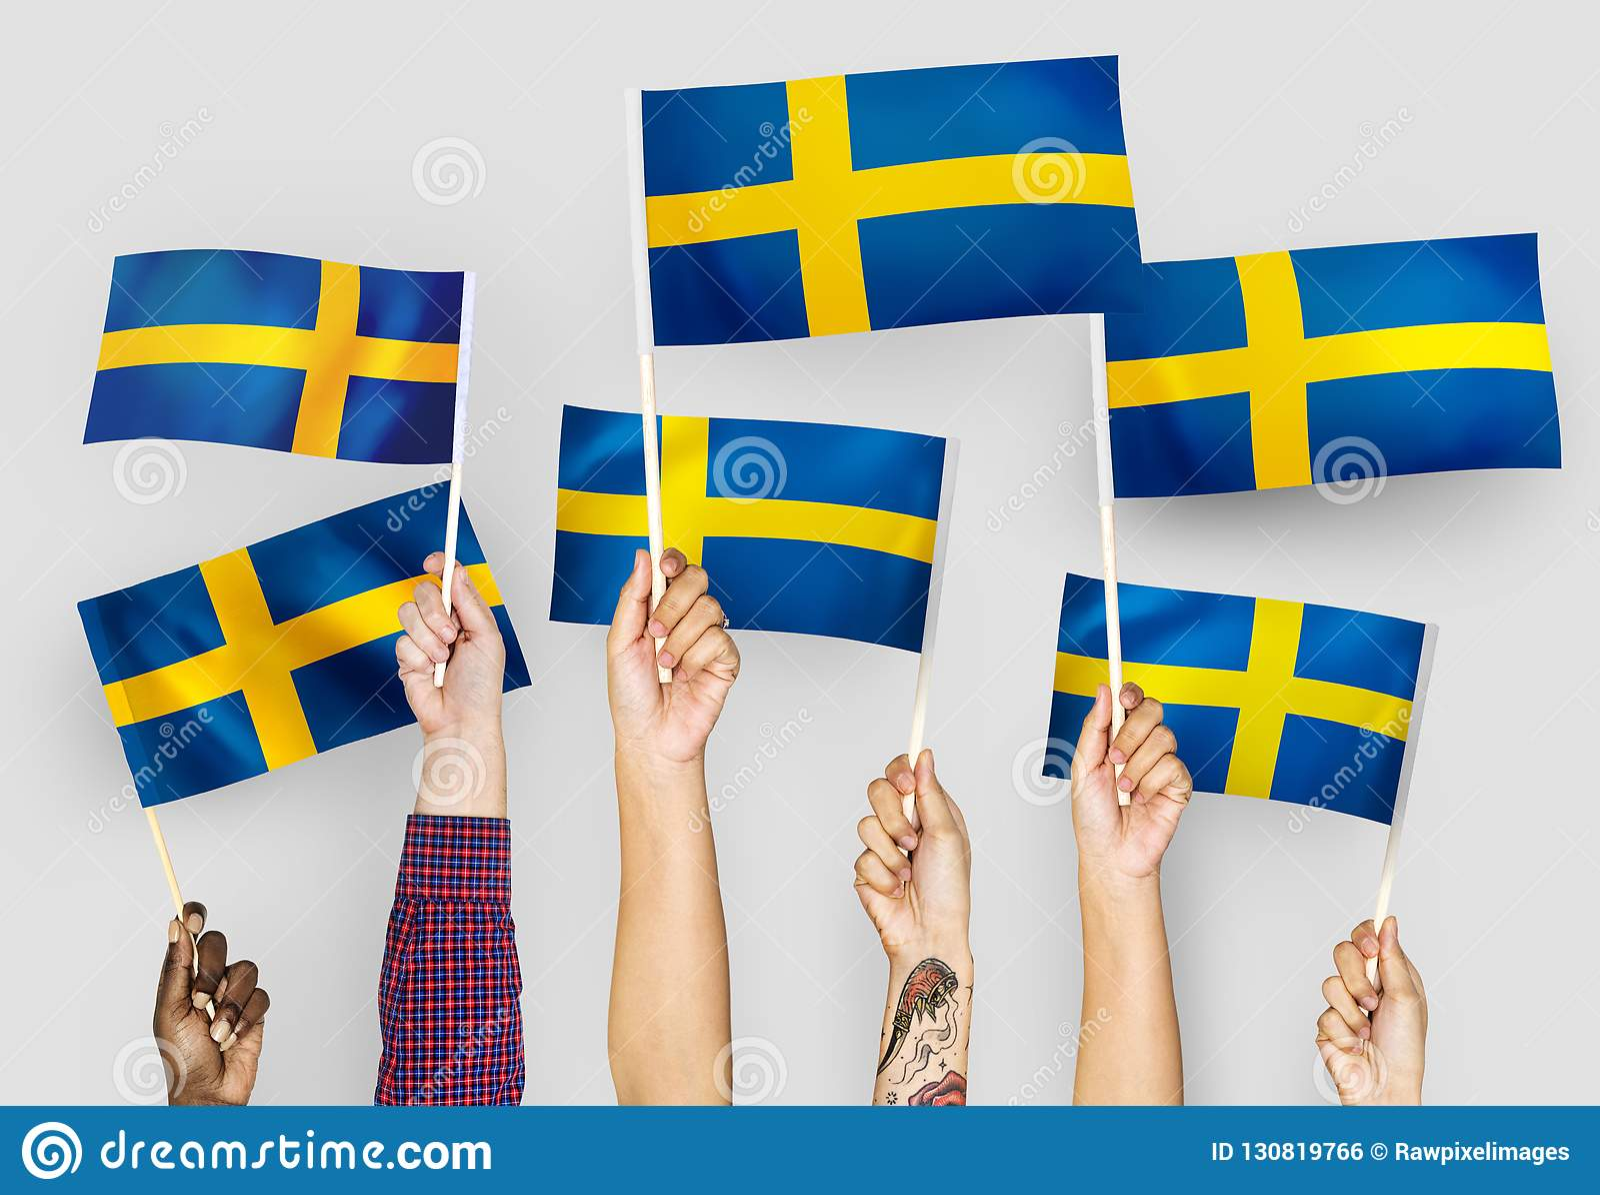 Hands waving the flags of Sweden